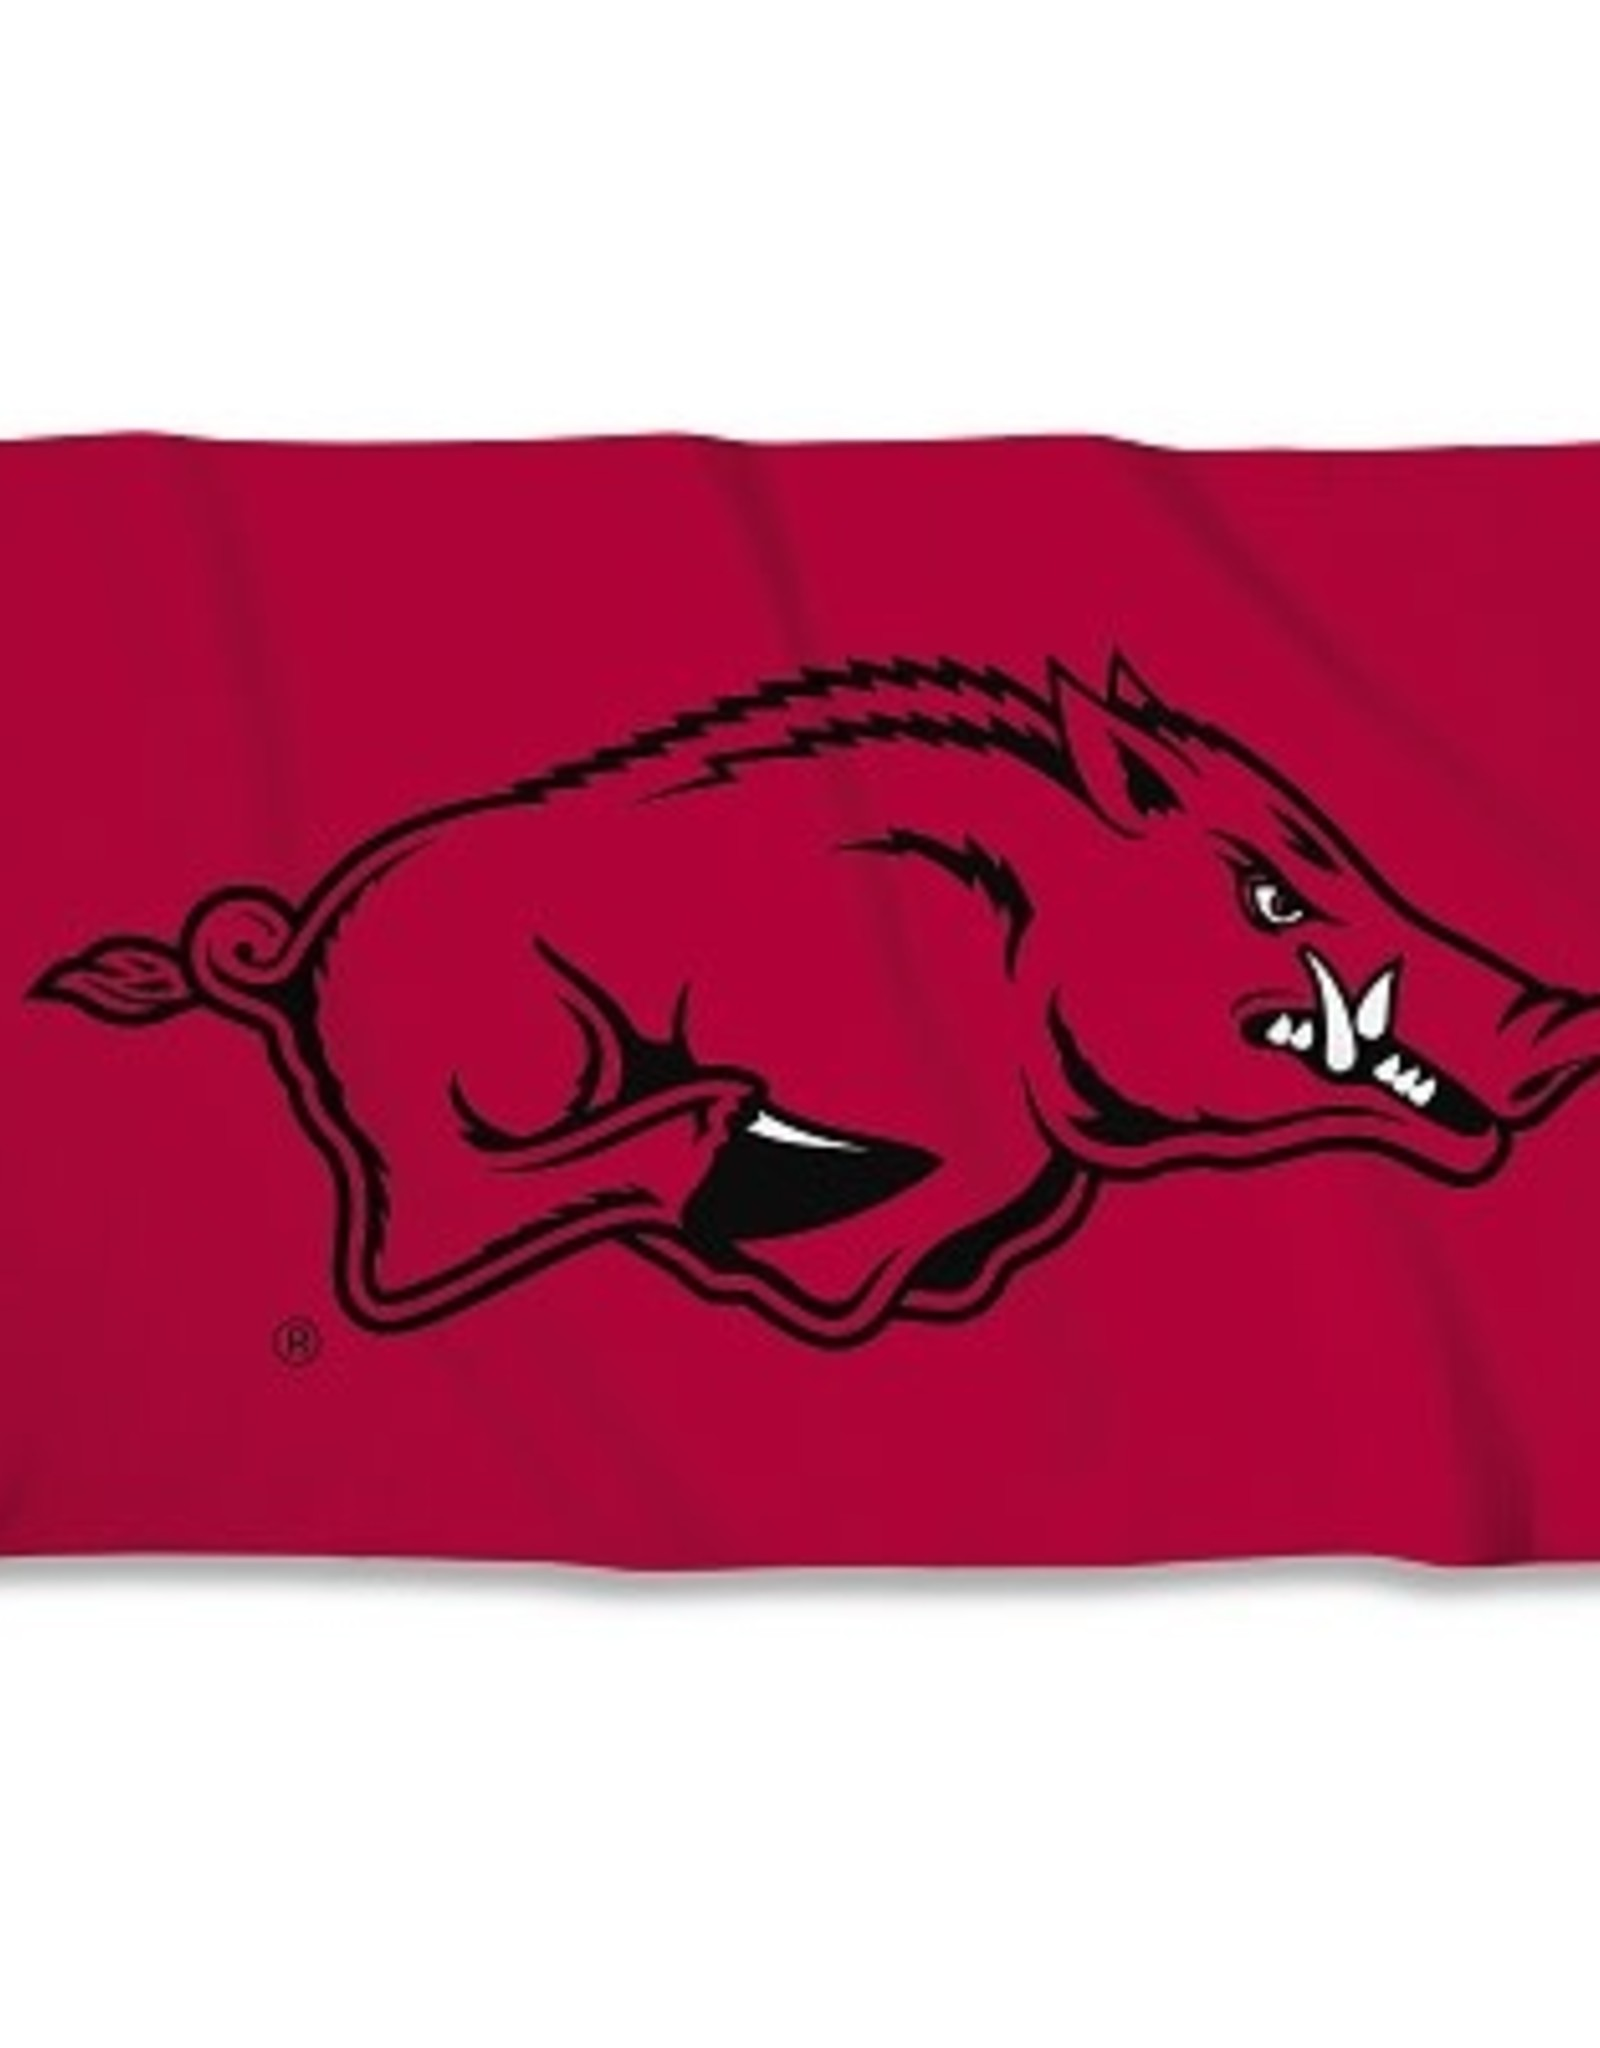 BSI Products Arkansas 3' X 5' Flag